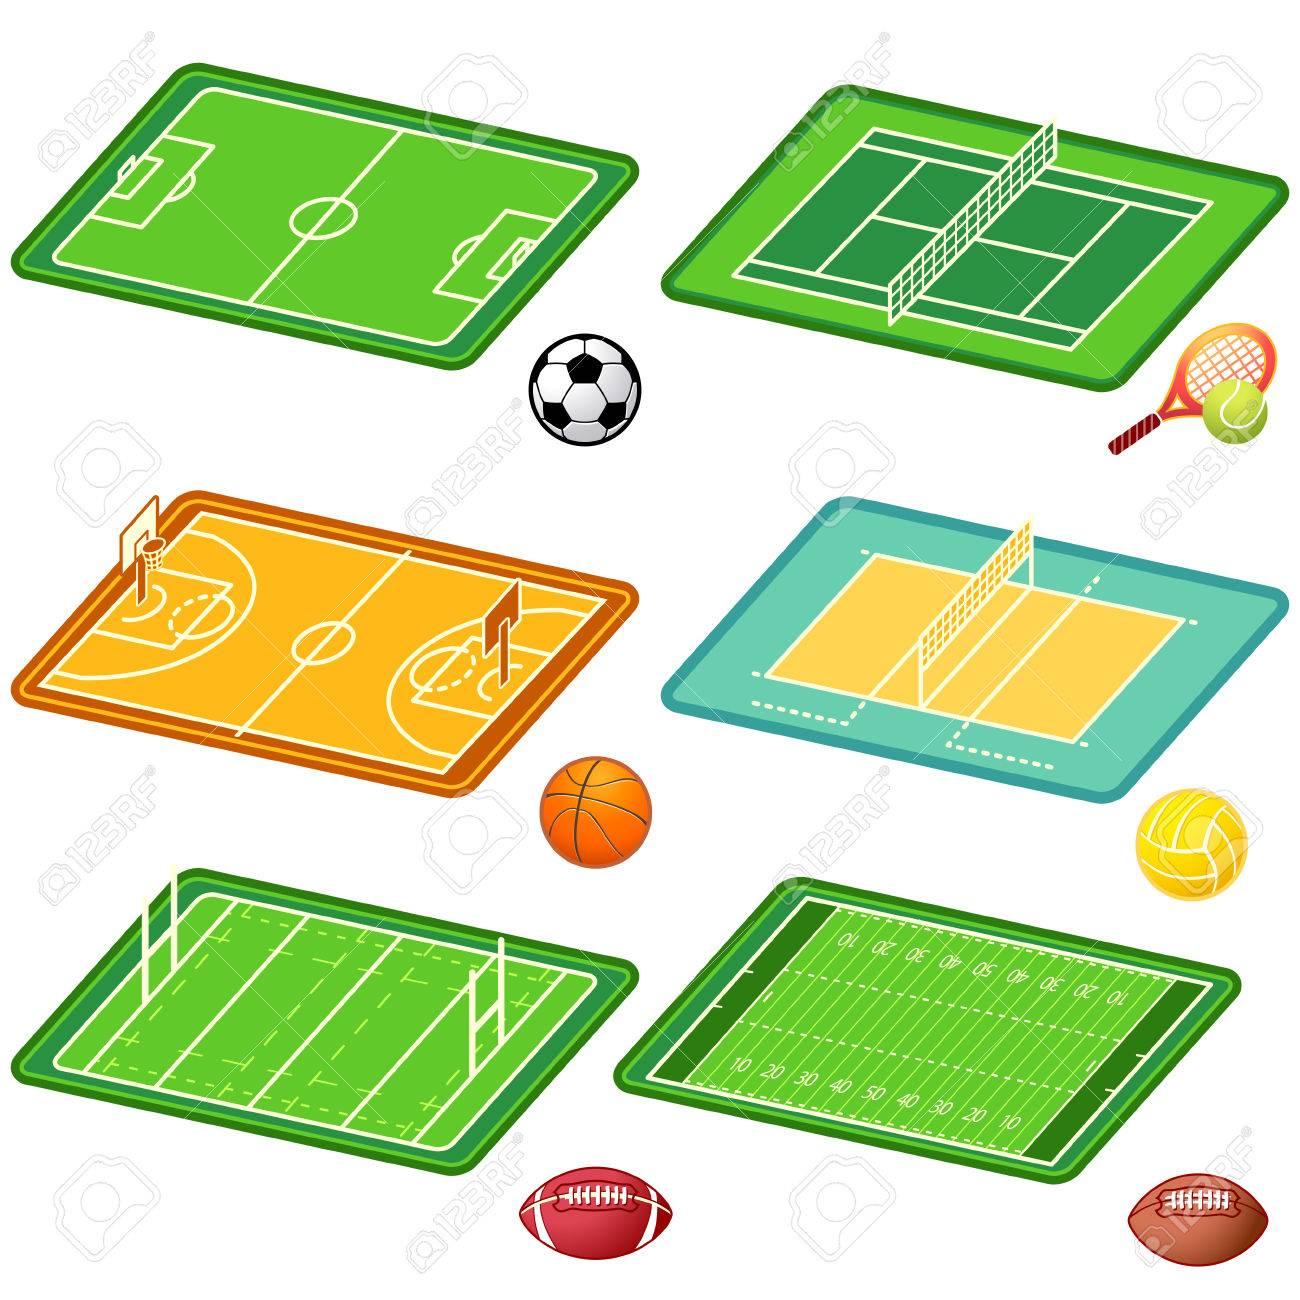 1300x1300 Soccer, Tennis, Basketball, Volleyball, Ragby, American Football